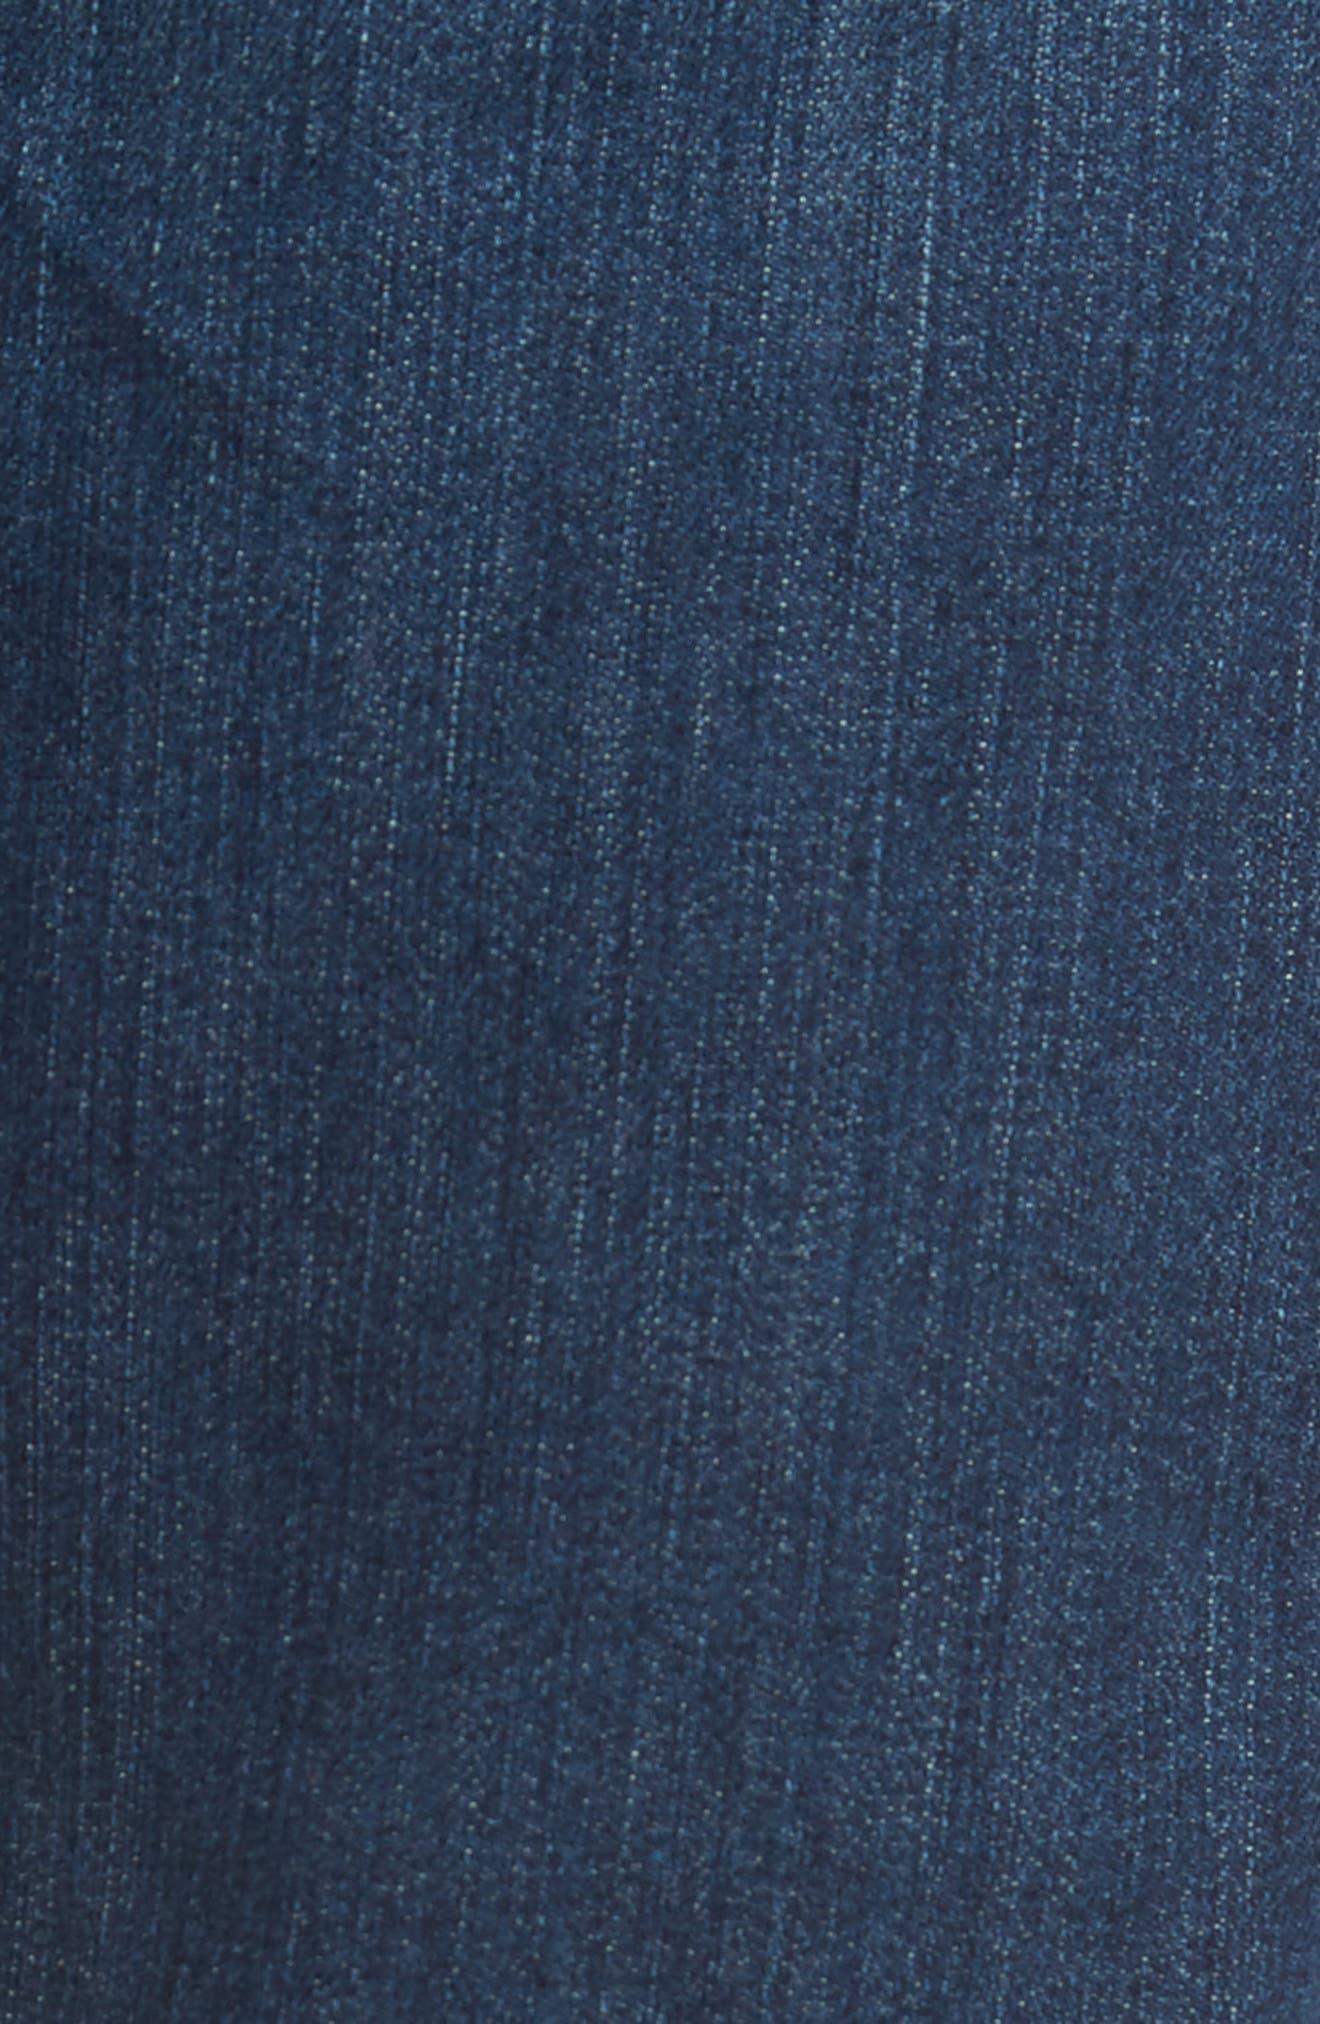 Federal Slim Straight Leg Jeans,                             Alternate thumbnail 5, color,                             Harlan